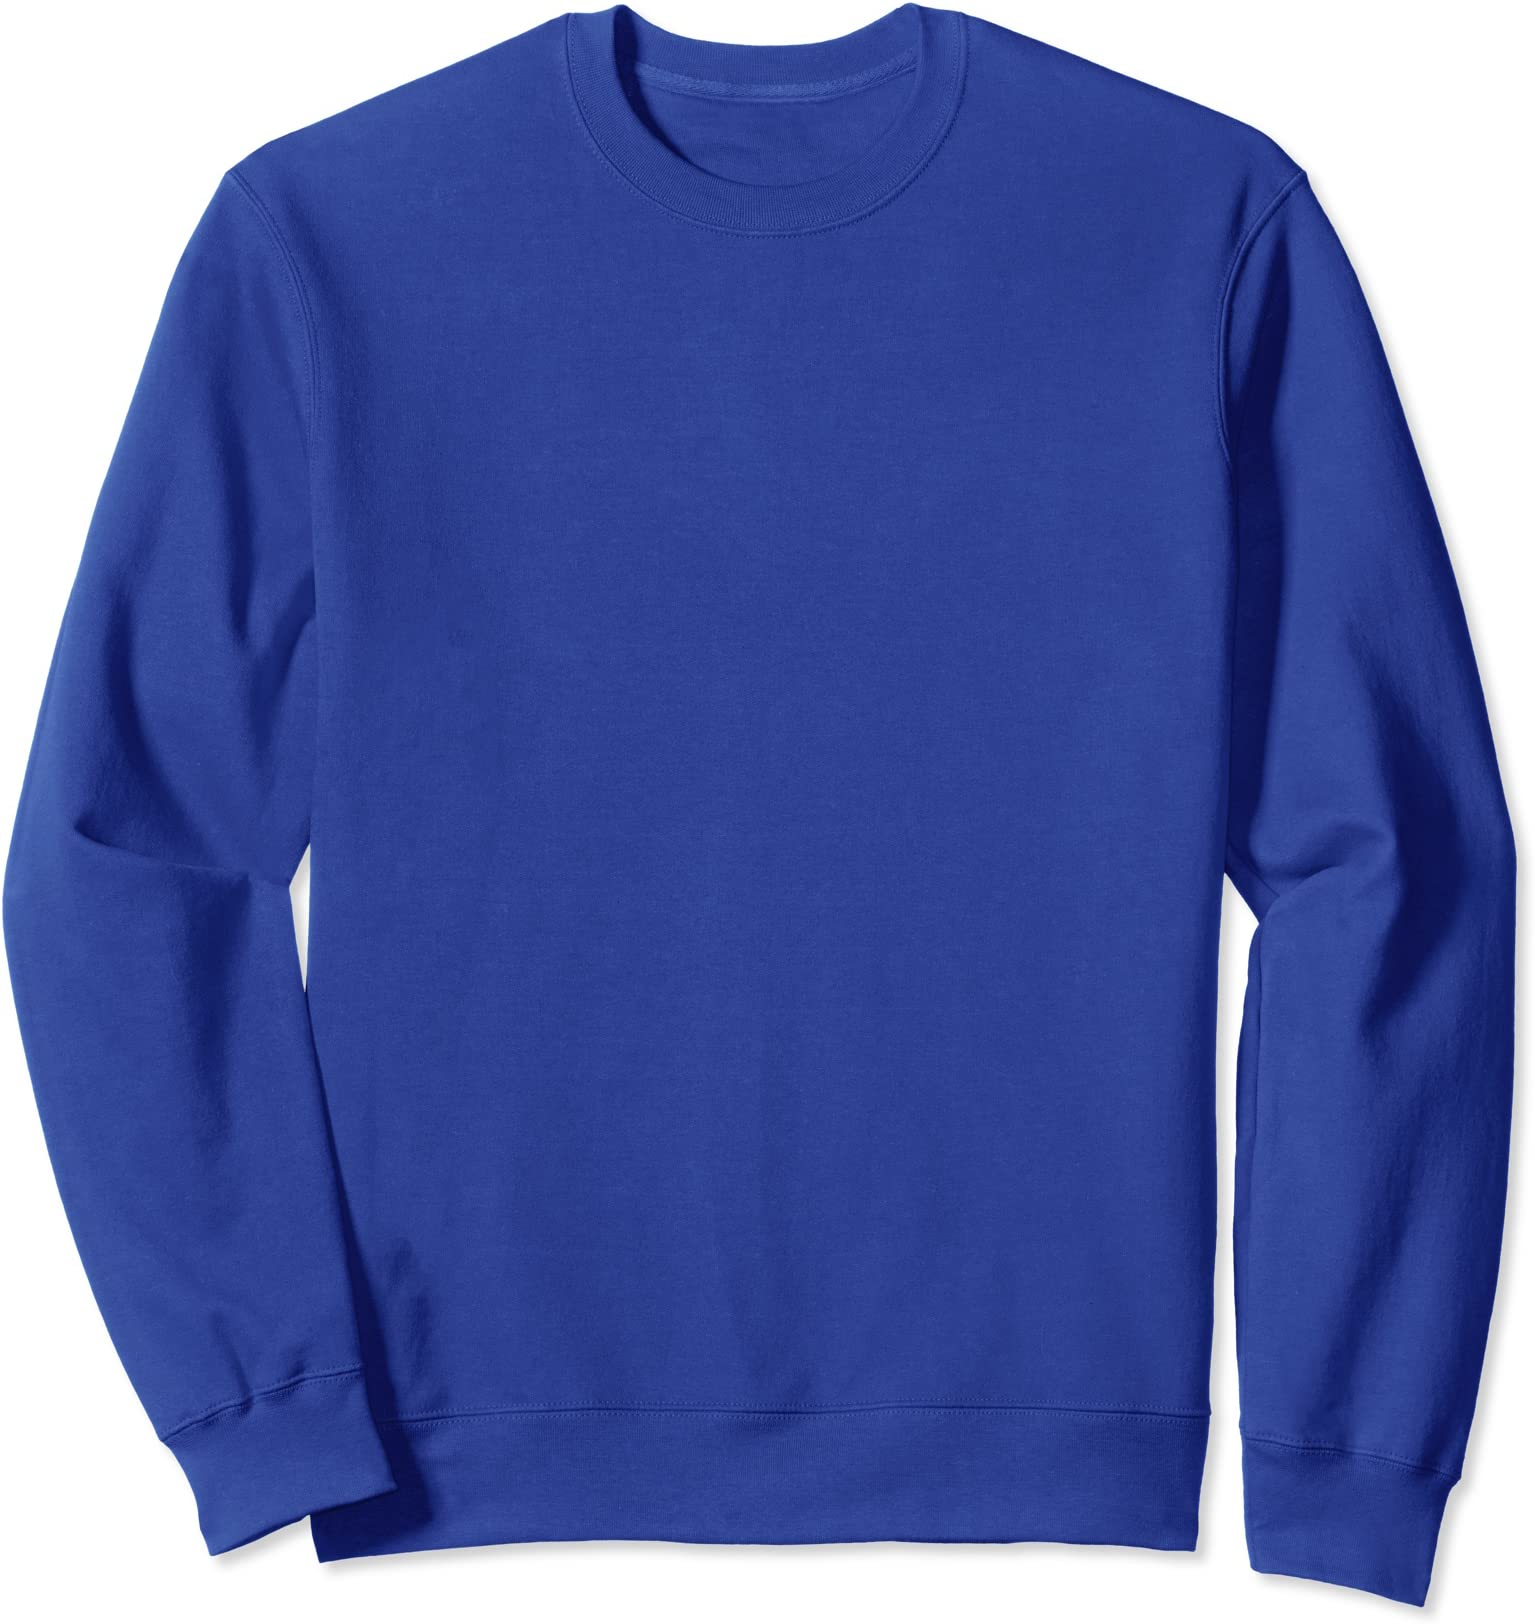 Light It Up Christmas Shirt Santa Claus Holiday Gift Idea Pullover Sweatshirt